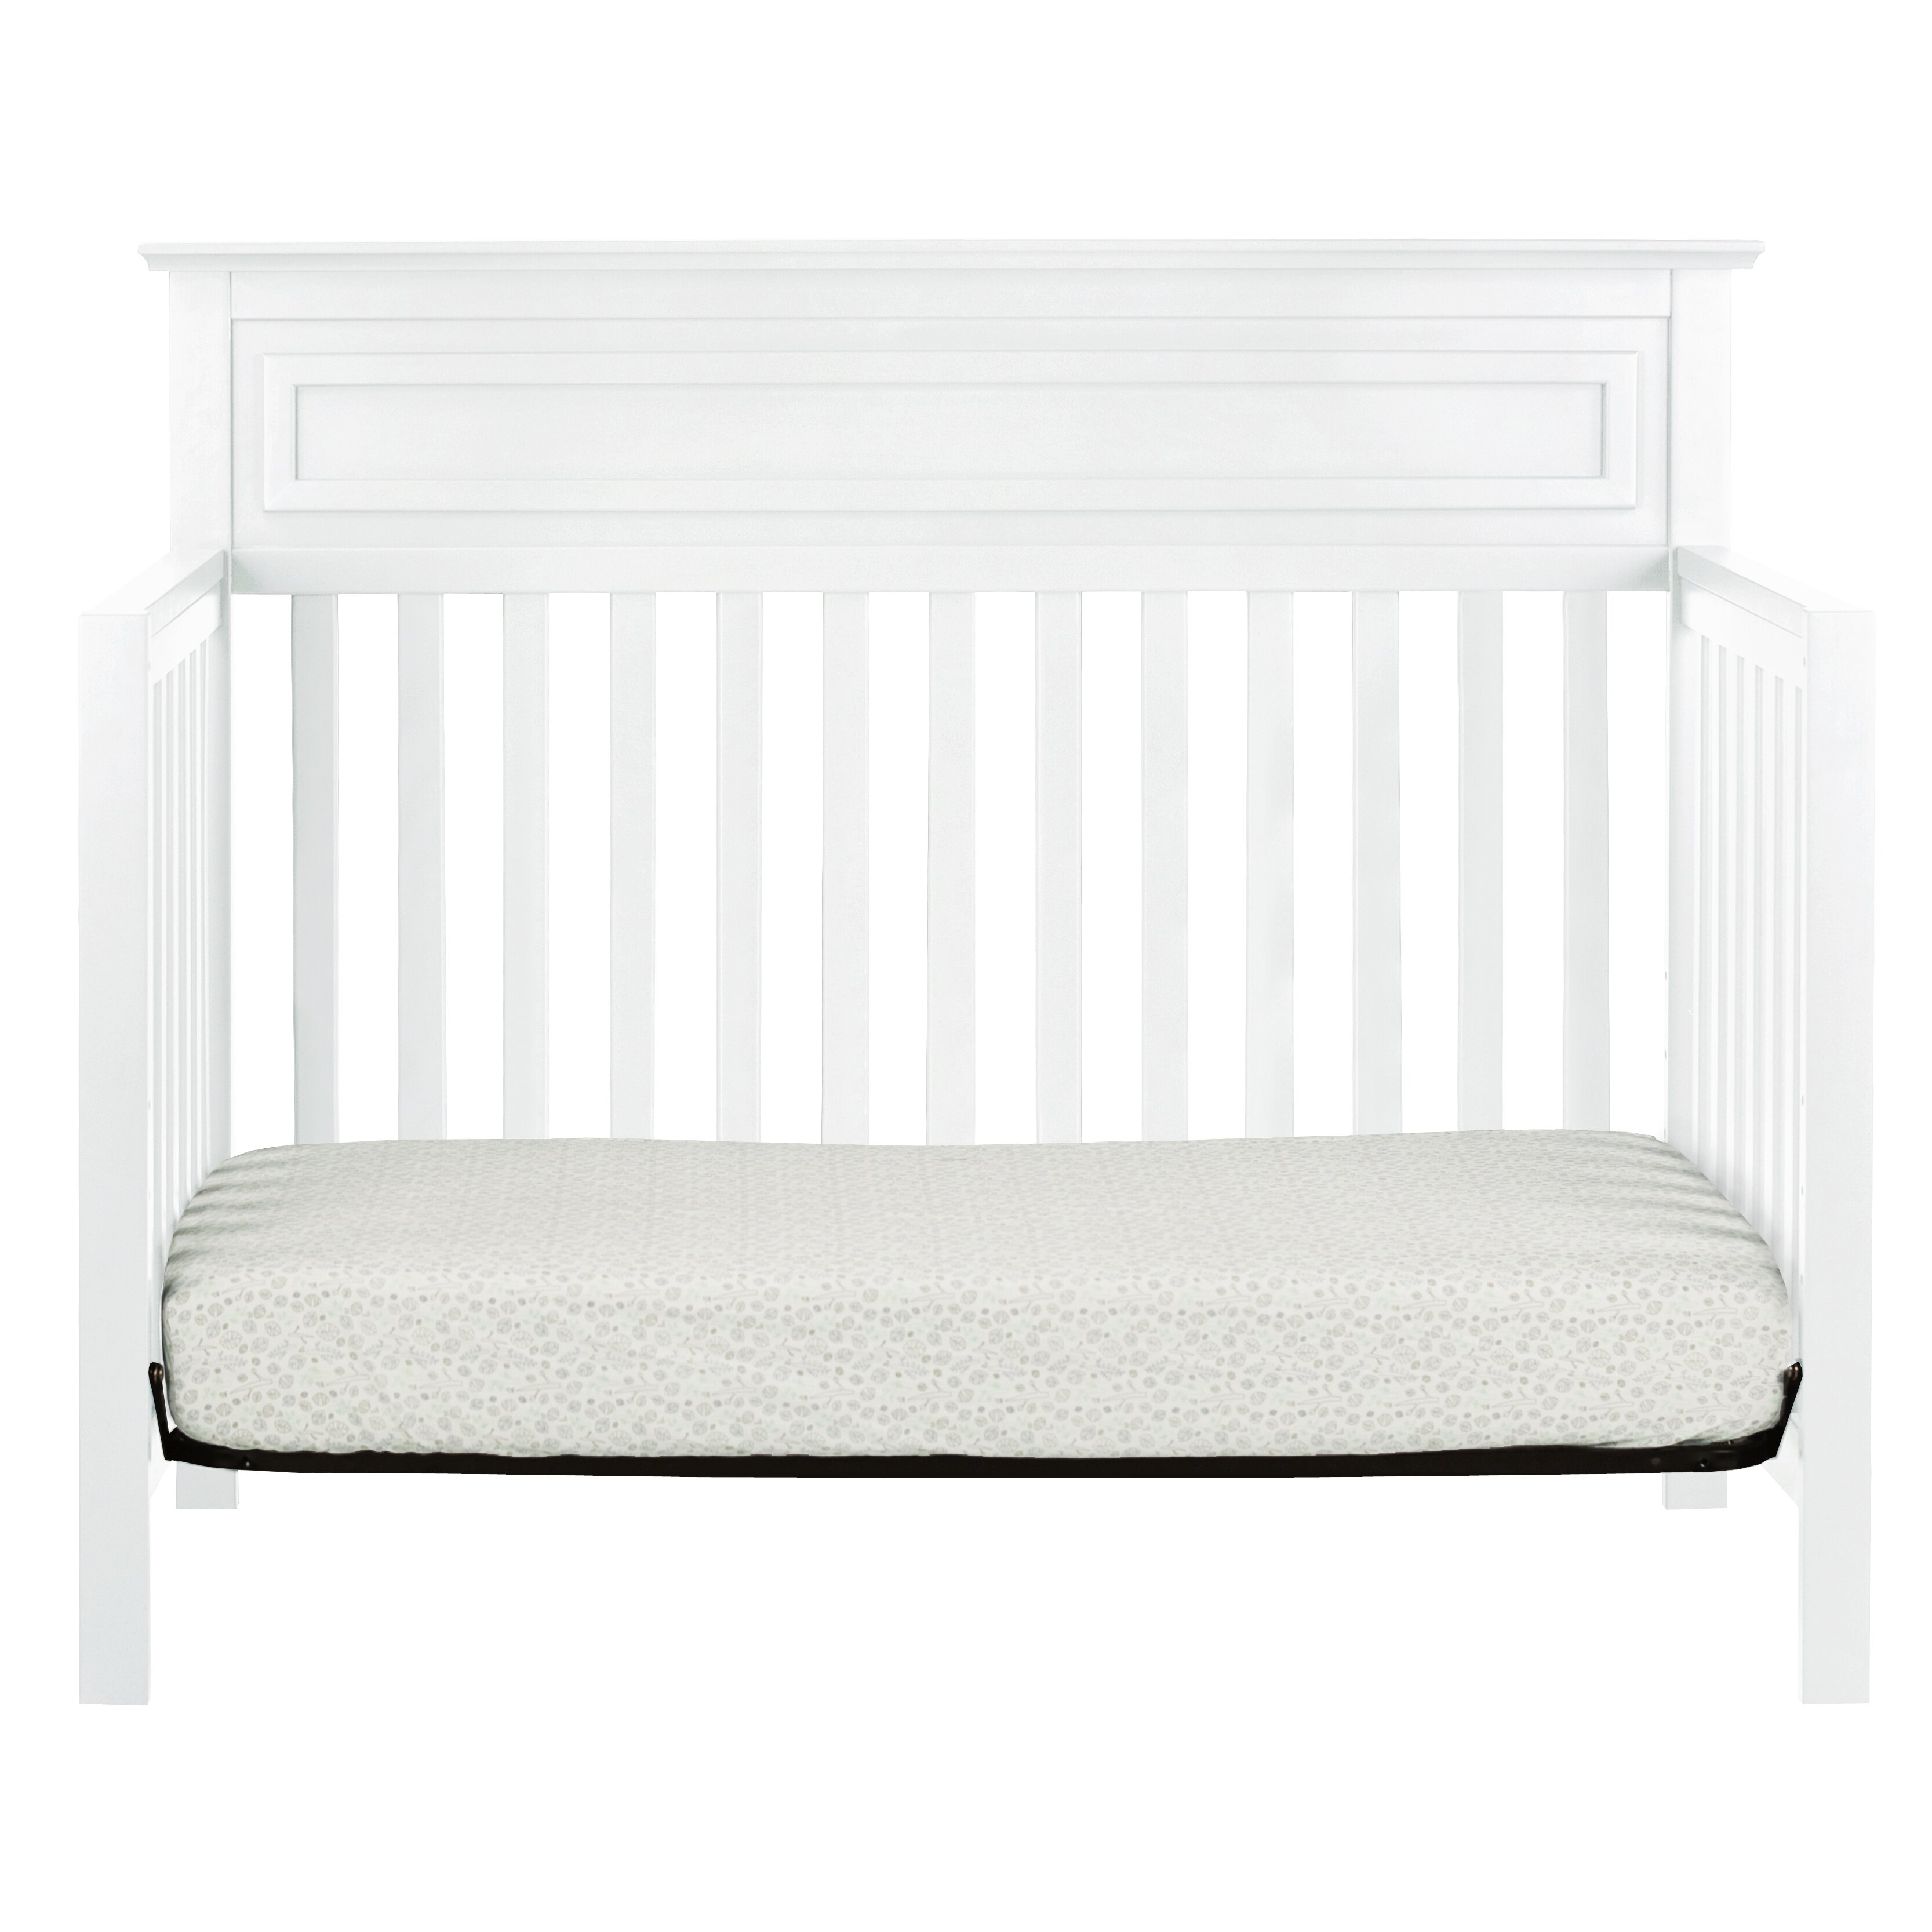 crib davinci bed conversion kit w espresso toddler baby lind cribs oak convertible in white sleigh rail magnifier slate jenny